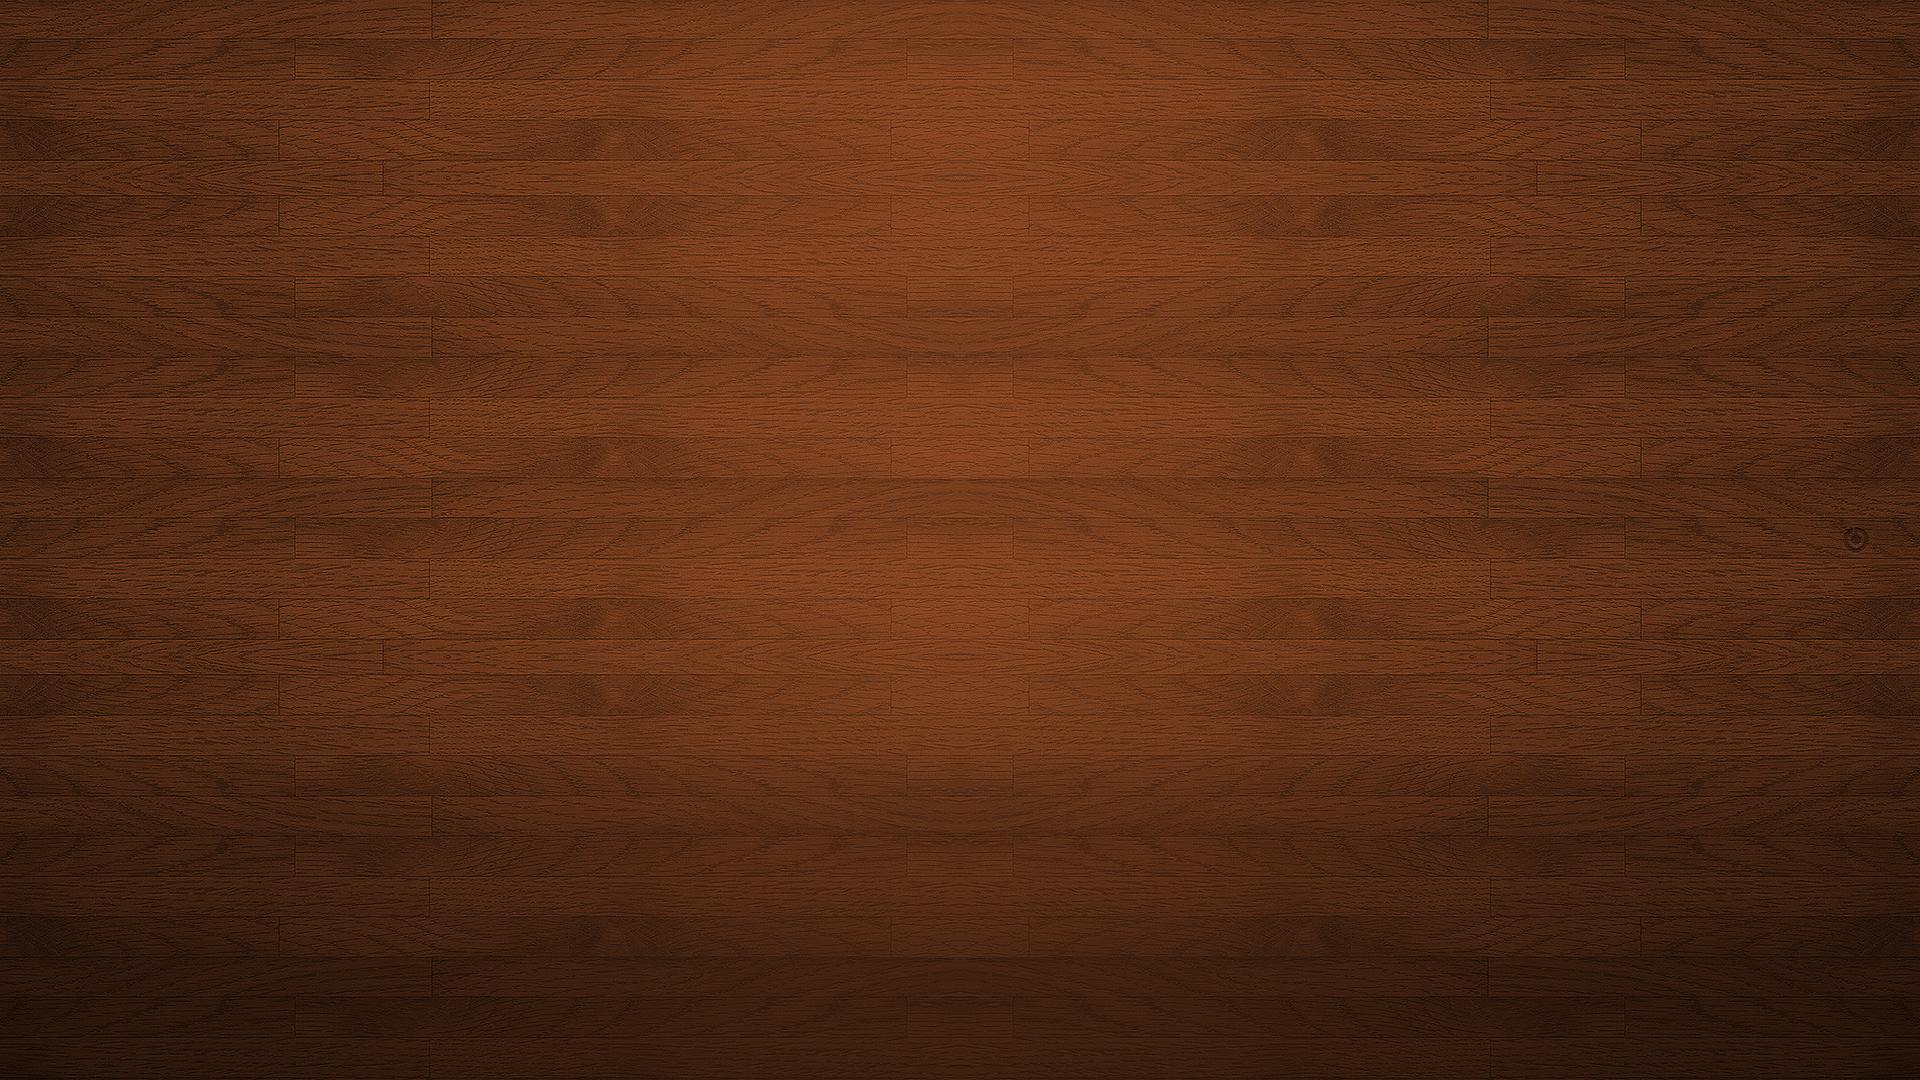 Minimalist Stage Floor 3d View Lights Wood Textures Backgrounds 1920x1080